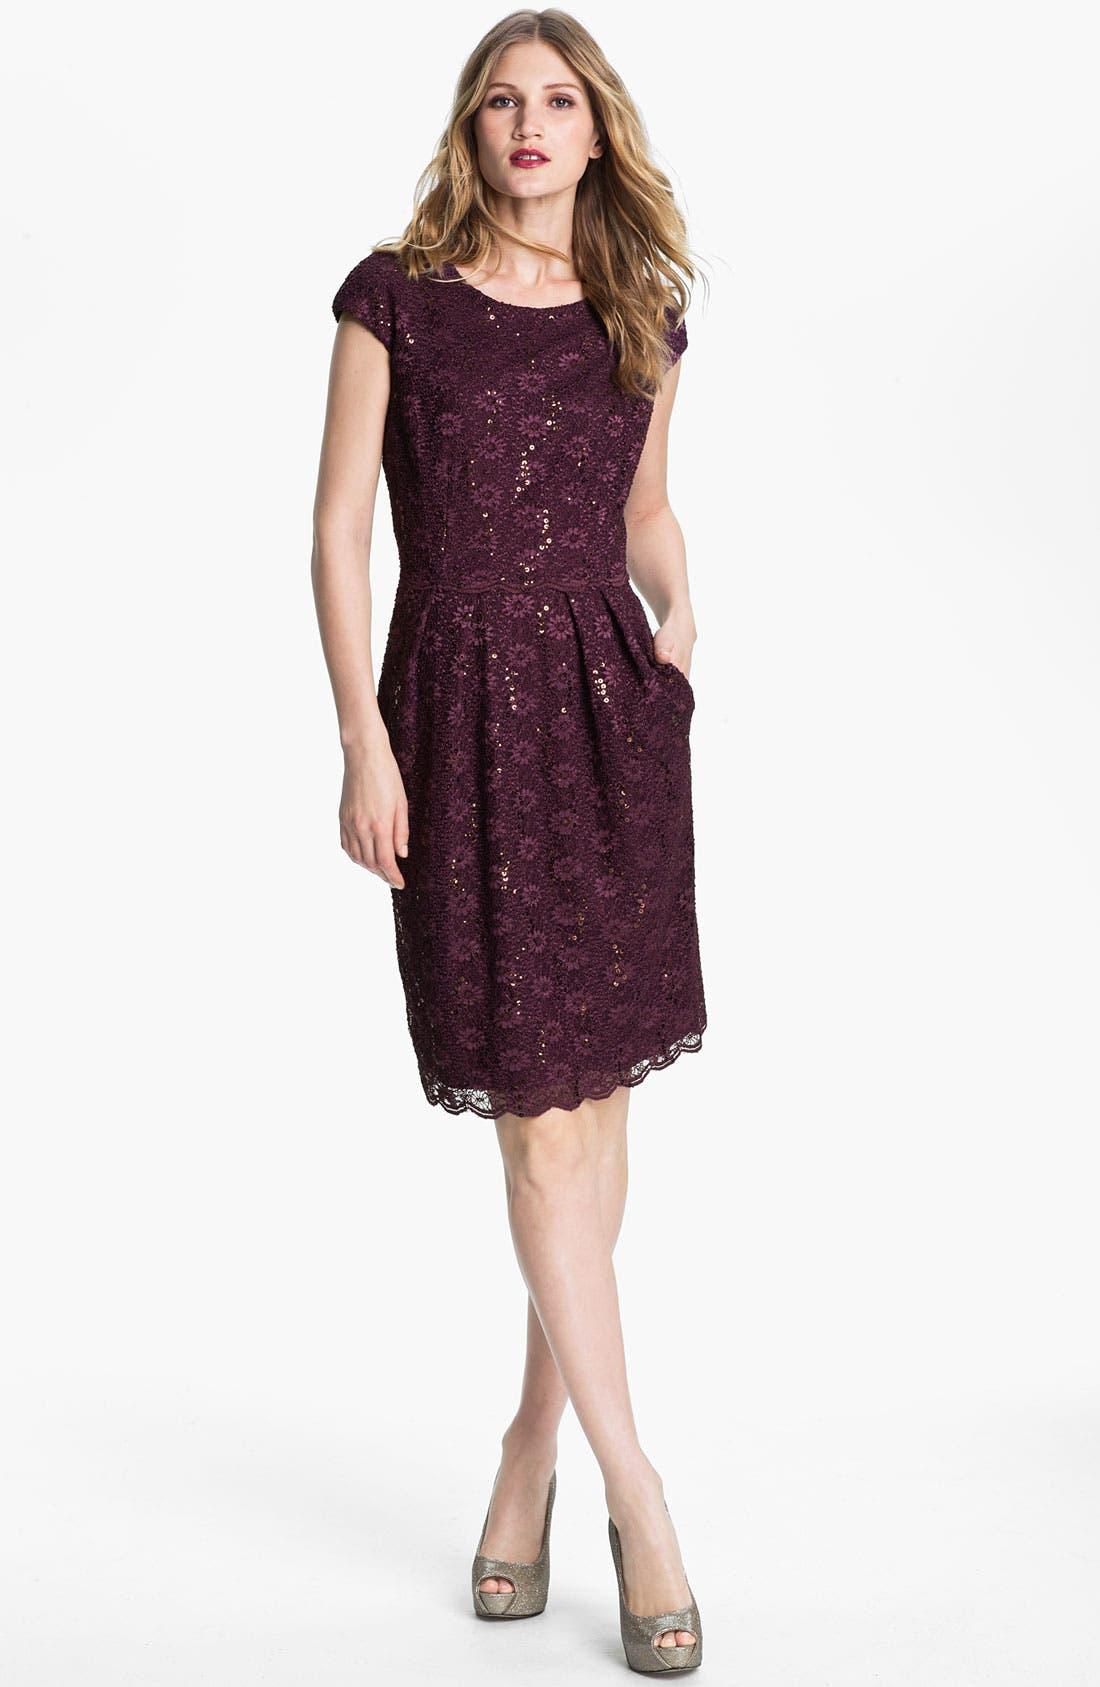 Alternate Image 1 Selected - Alex Evenings Sequin Lace Overlay Sheath Dress (Petite)